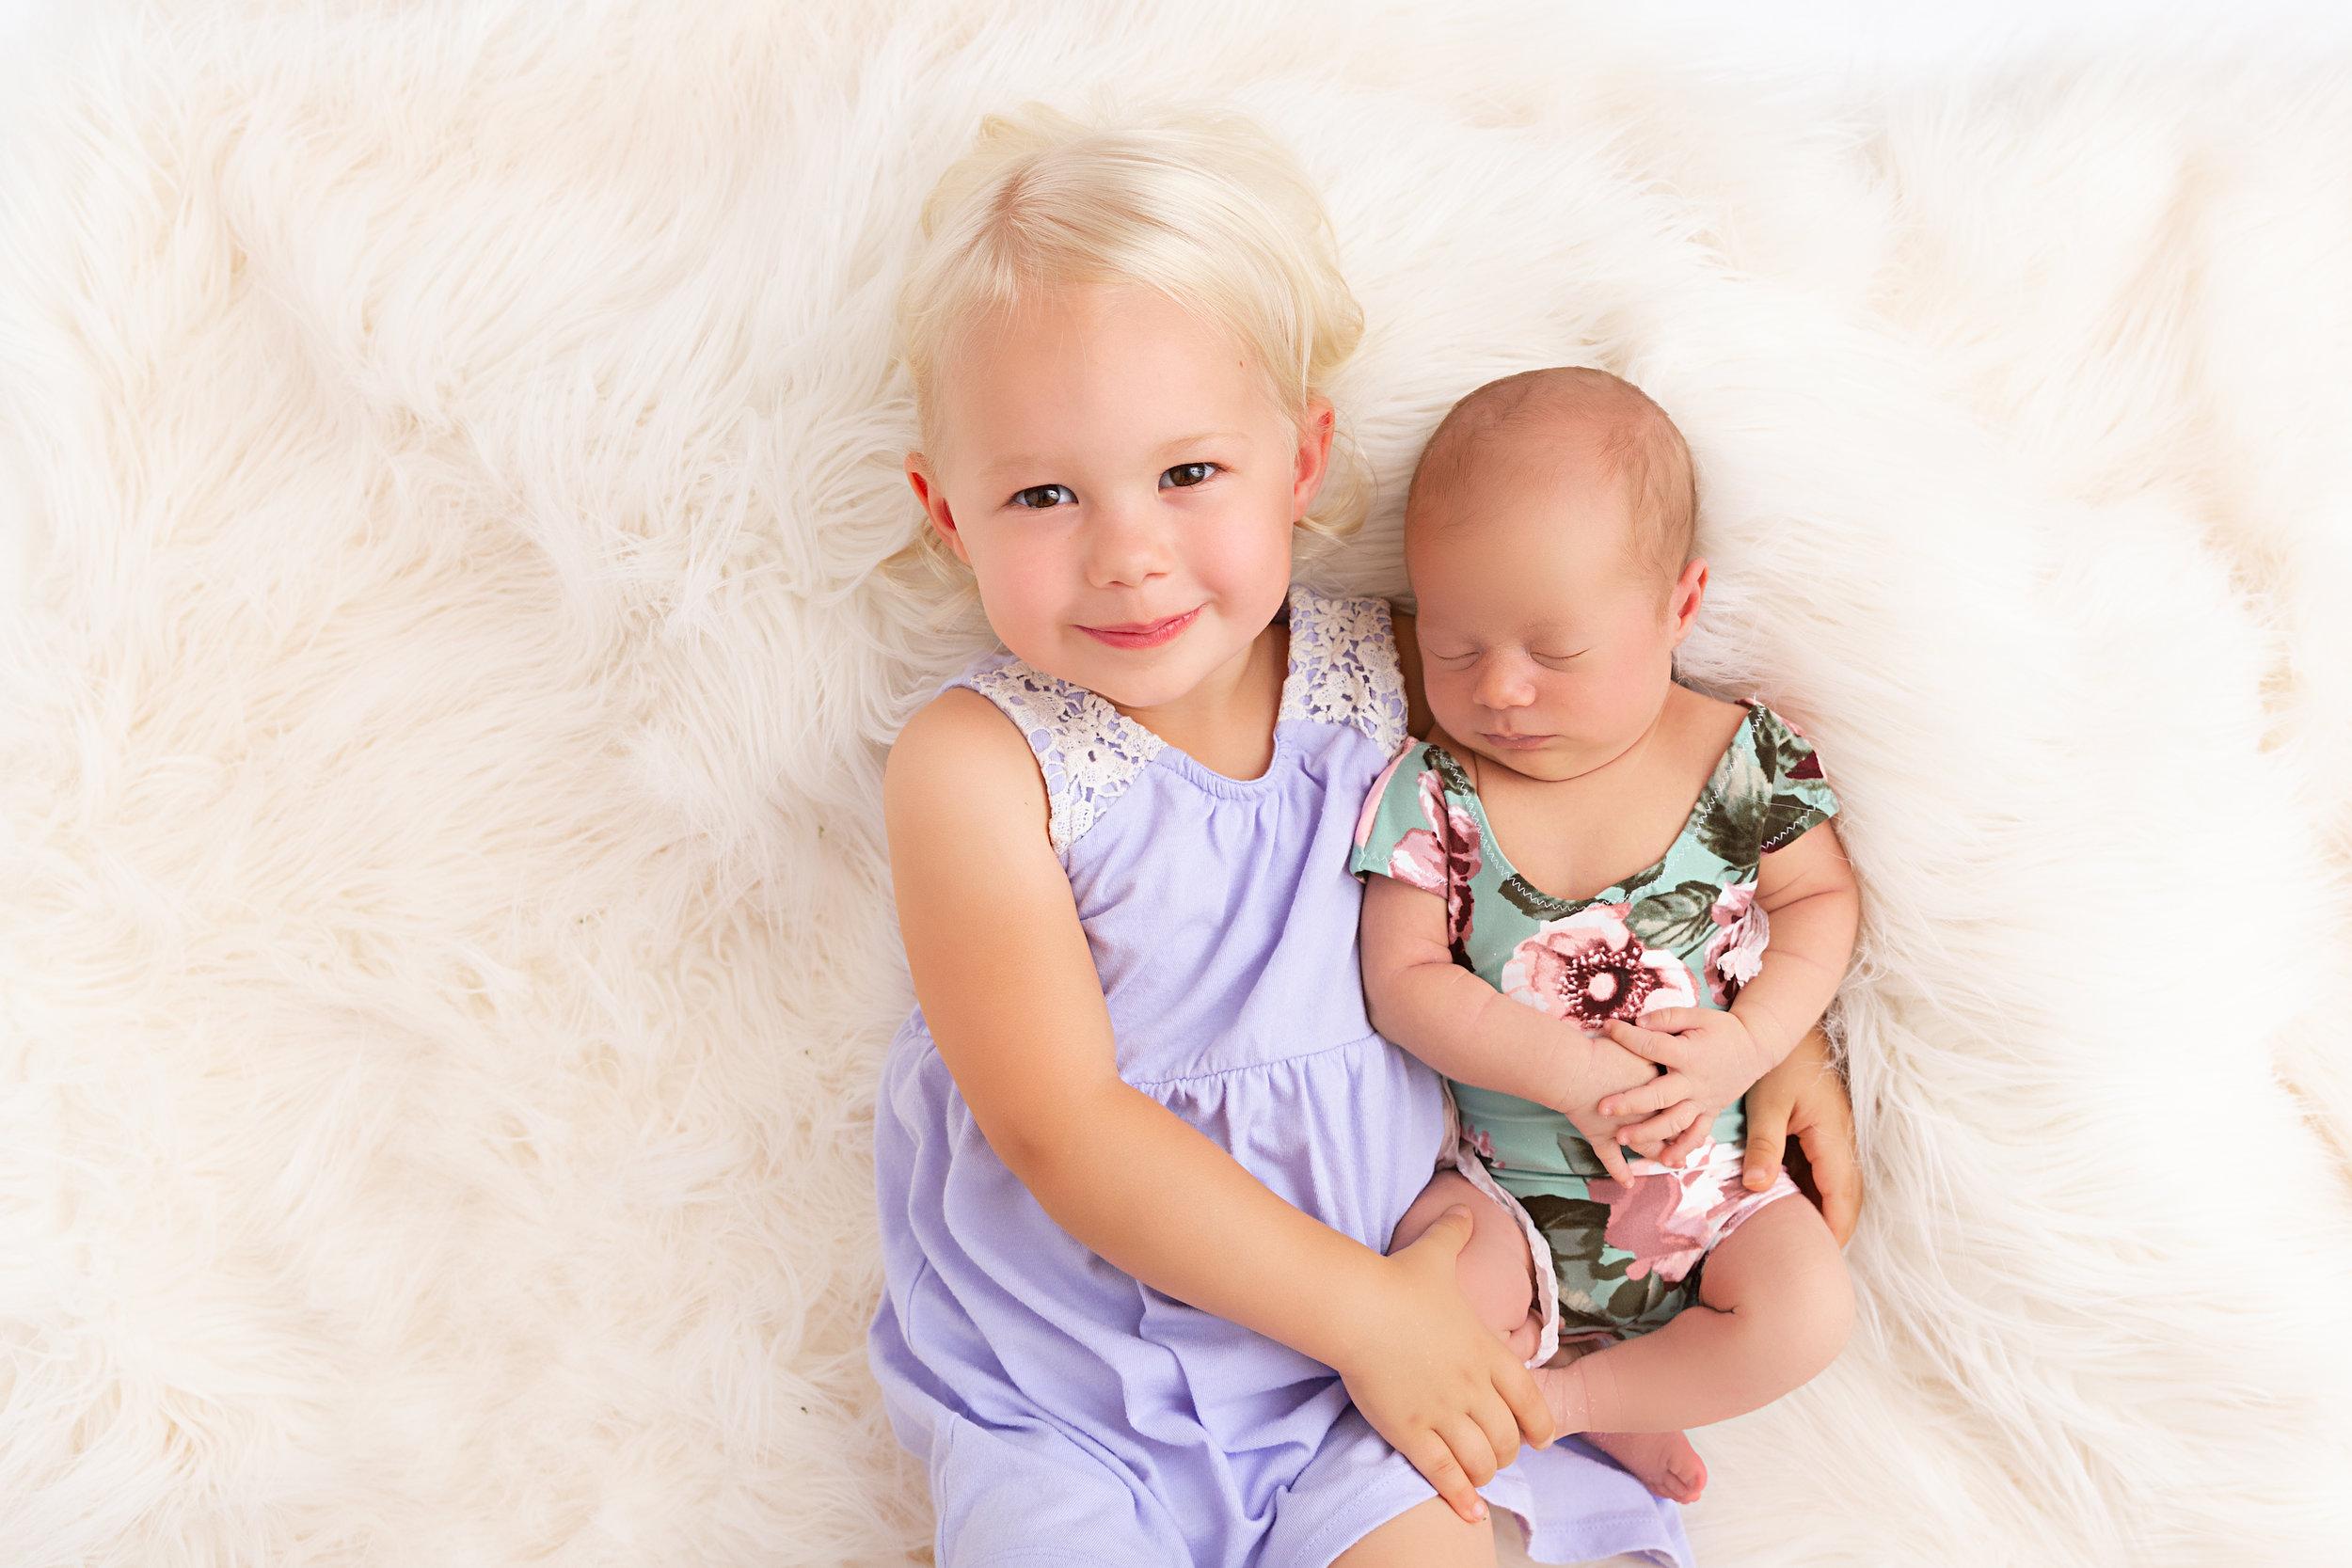 newborn baby and big sister